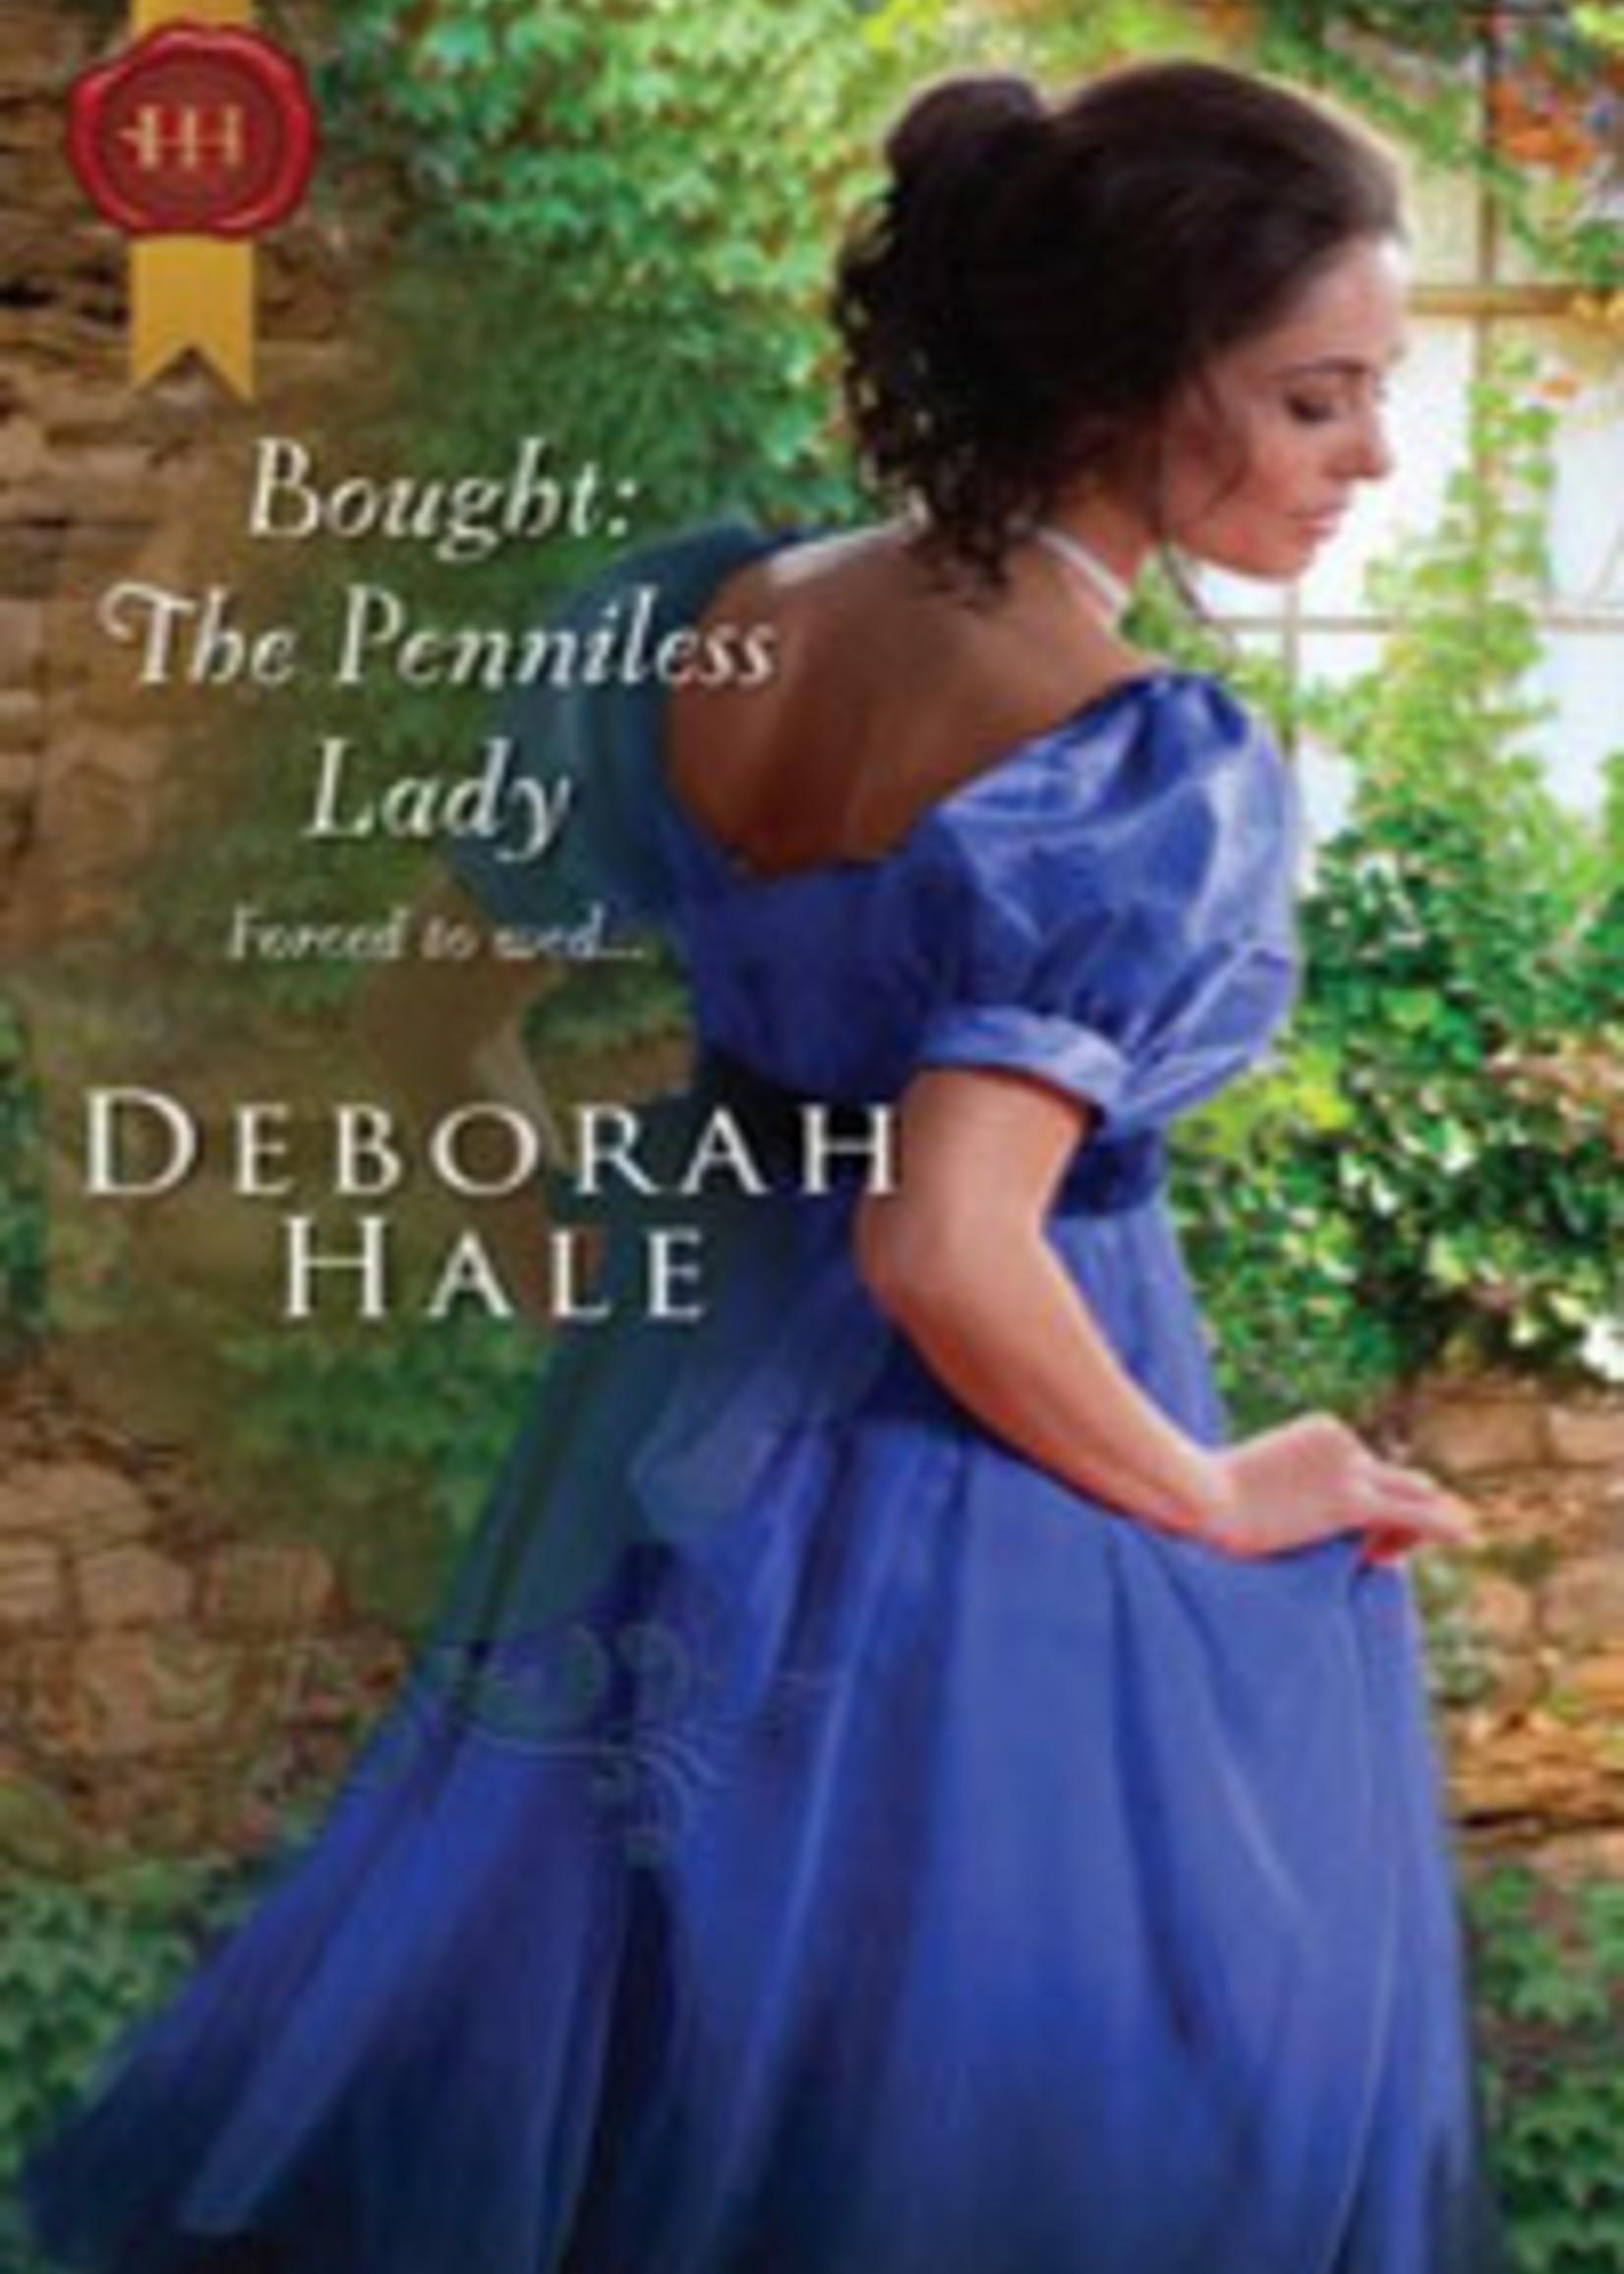 Bought: The Penniless Lady by Deborah Hale